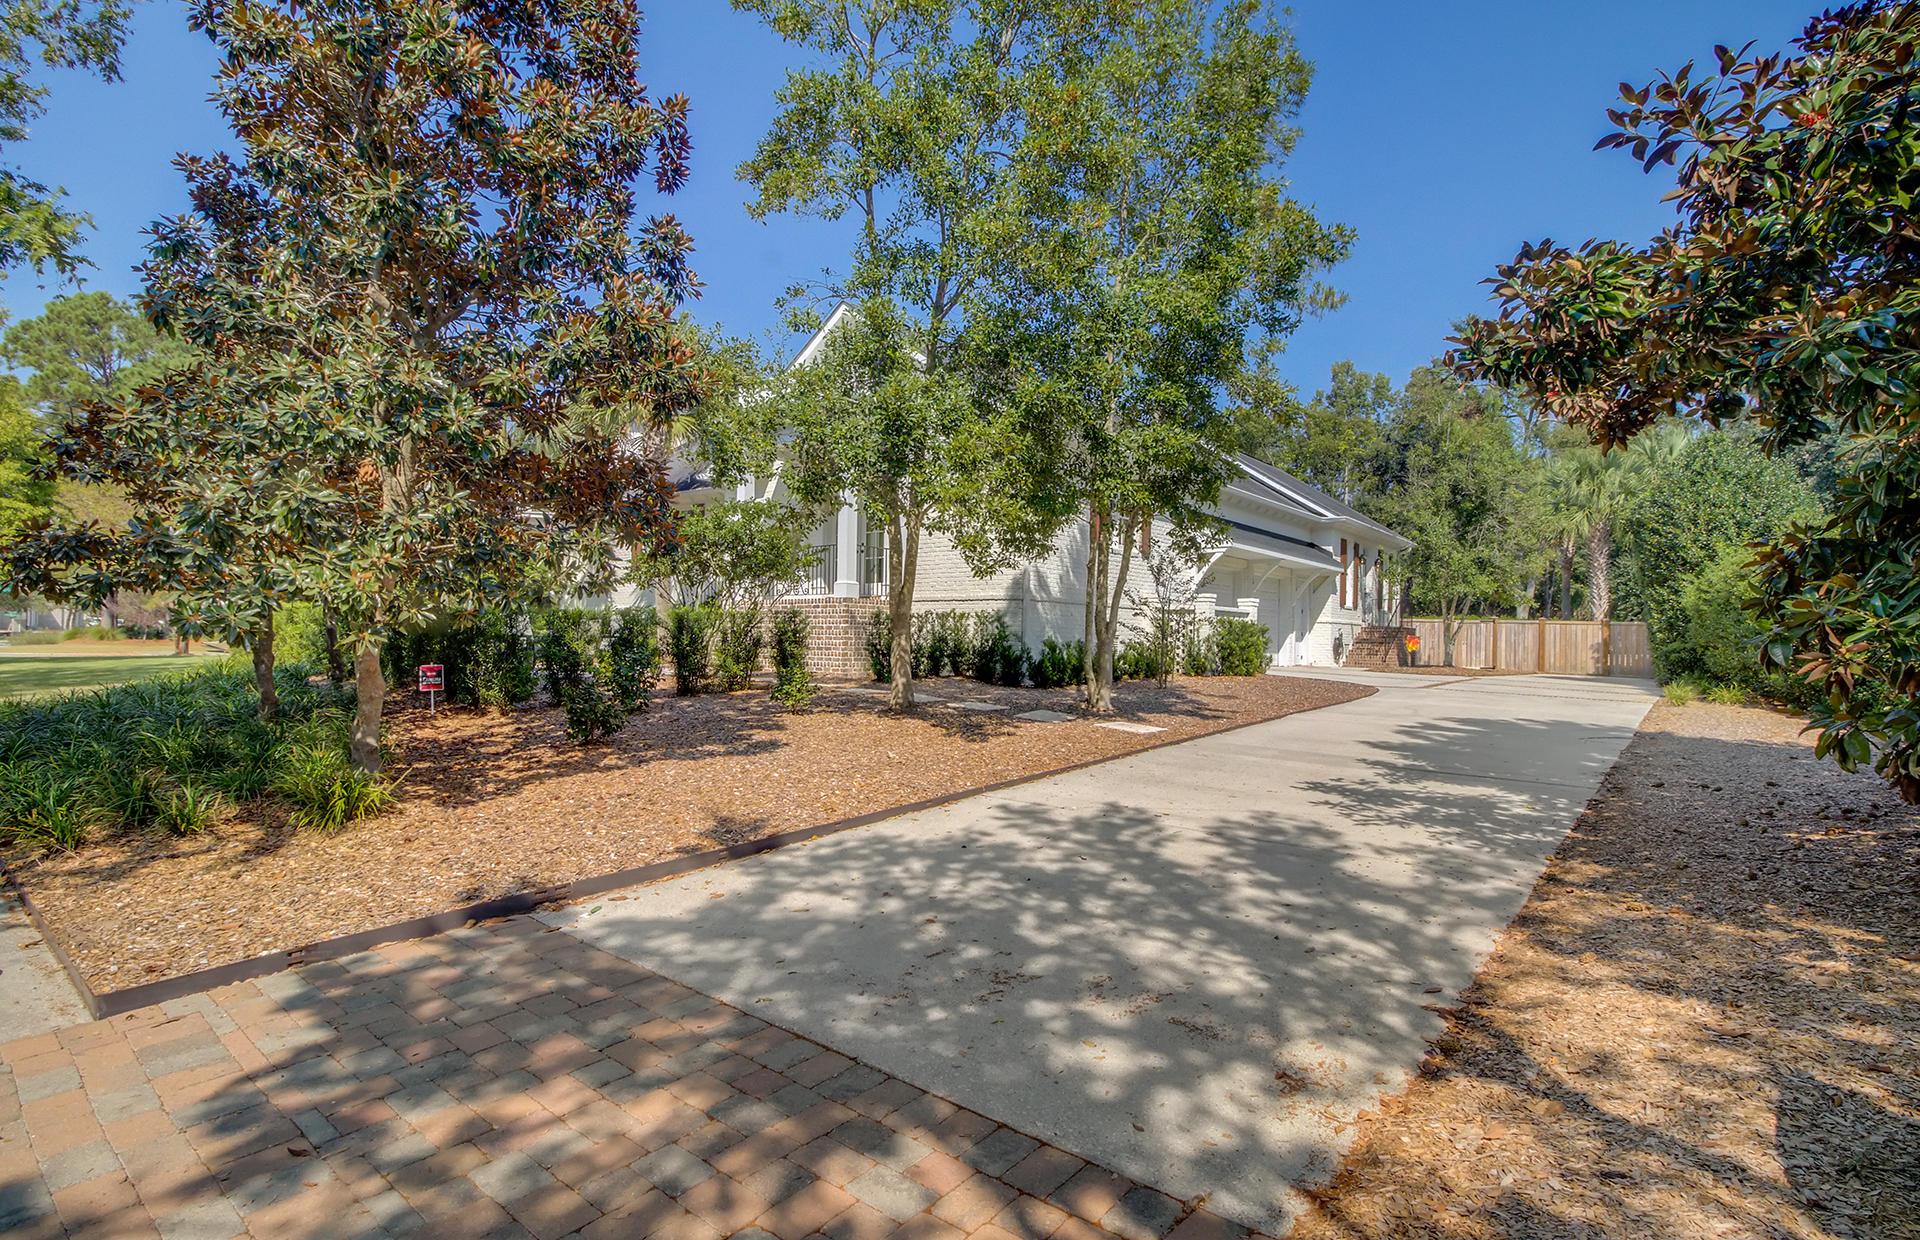 Olde Park Homes For Sale - 770 Olde Central, Mount Pleasant, SC - 91